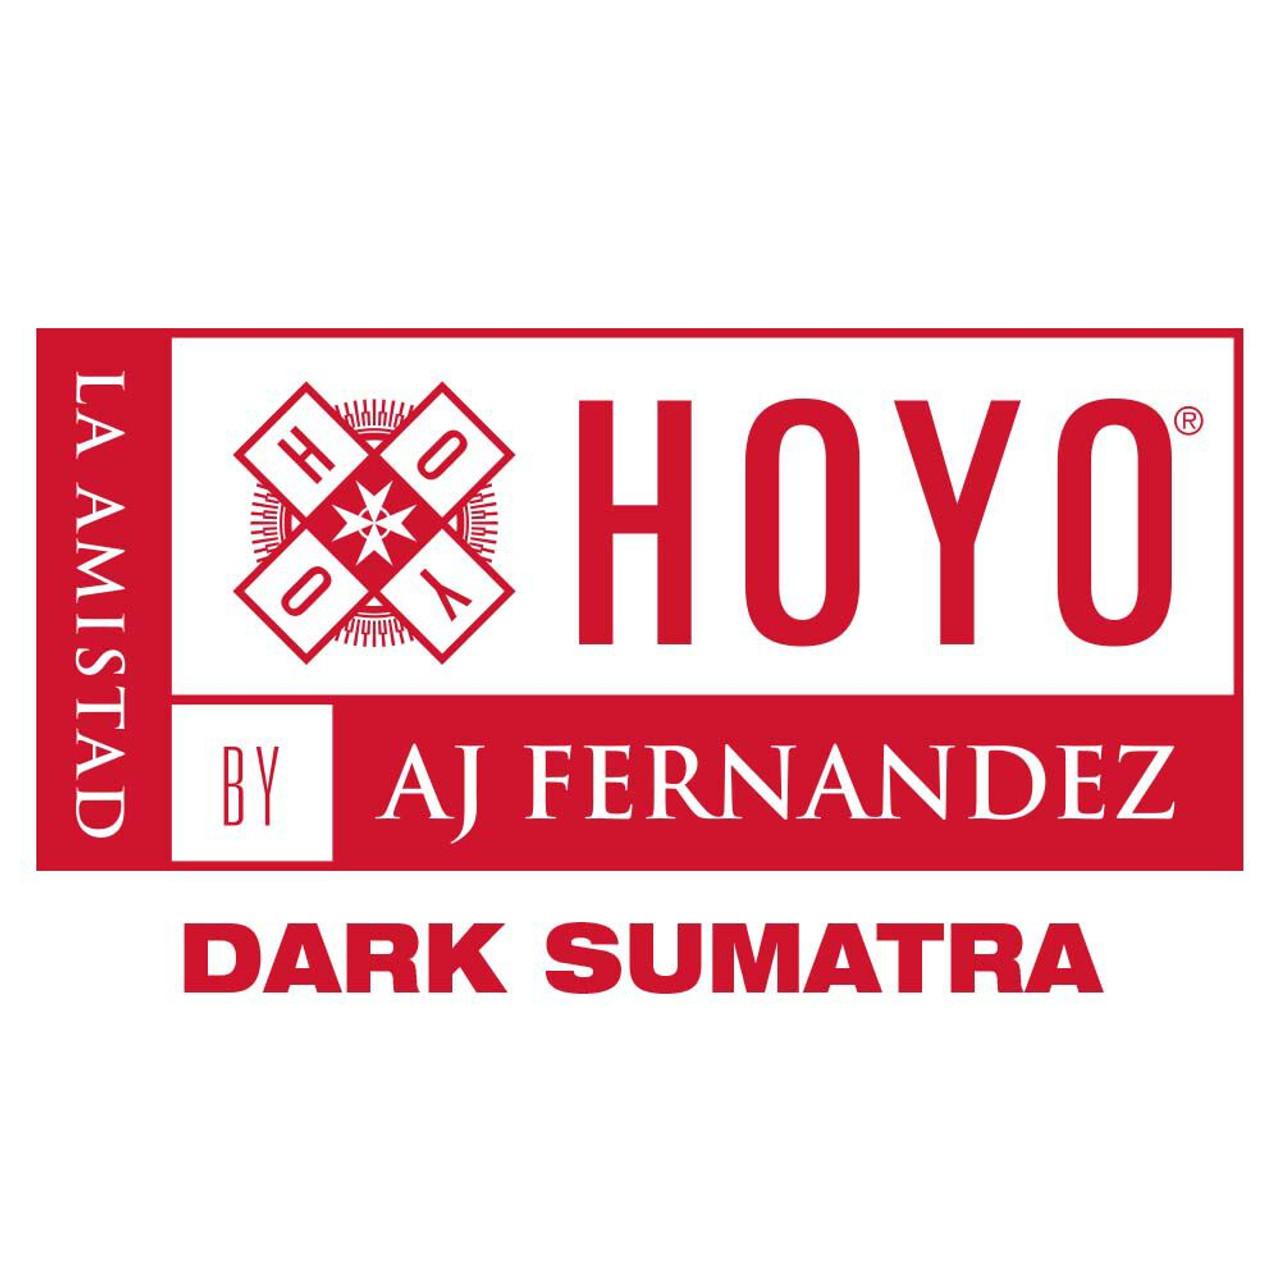 Hoyo La Amistad Dark Sumatra Espresso Cigars - 4.5 x 50 (Box of 20)